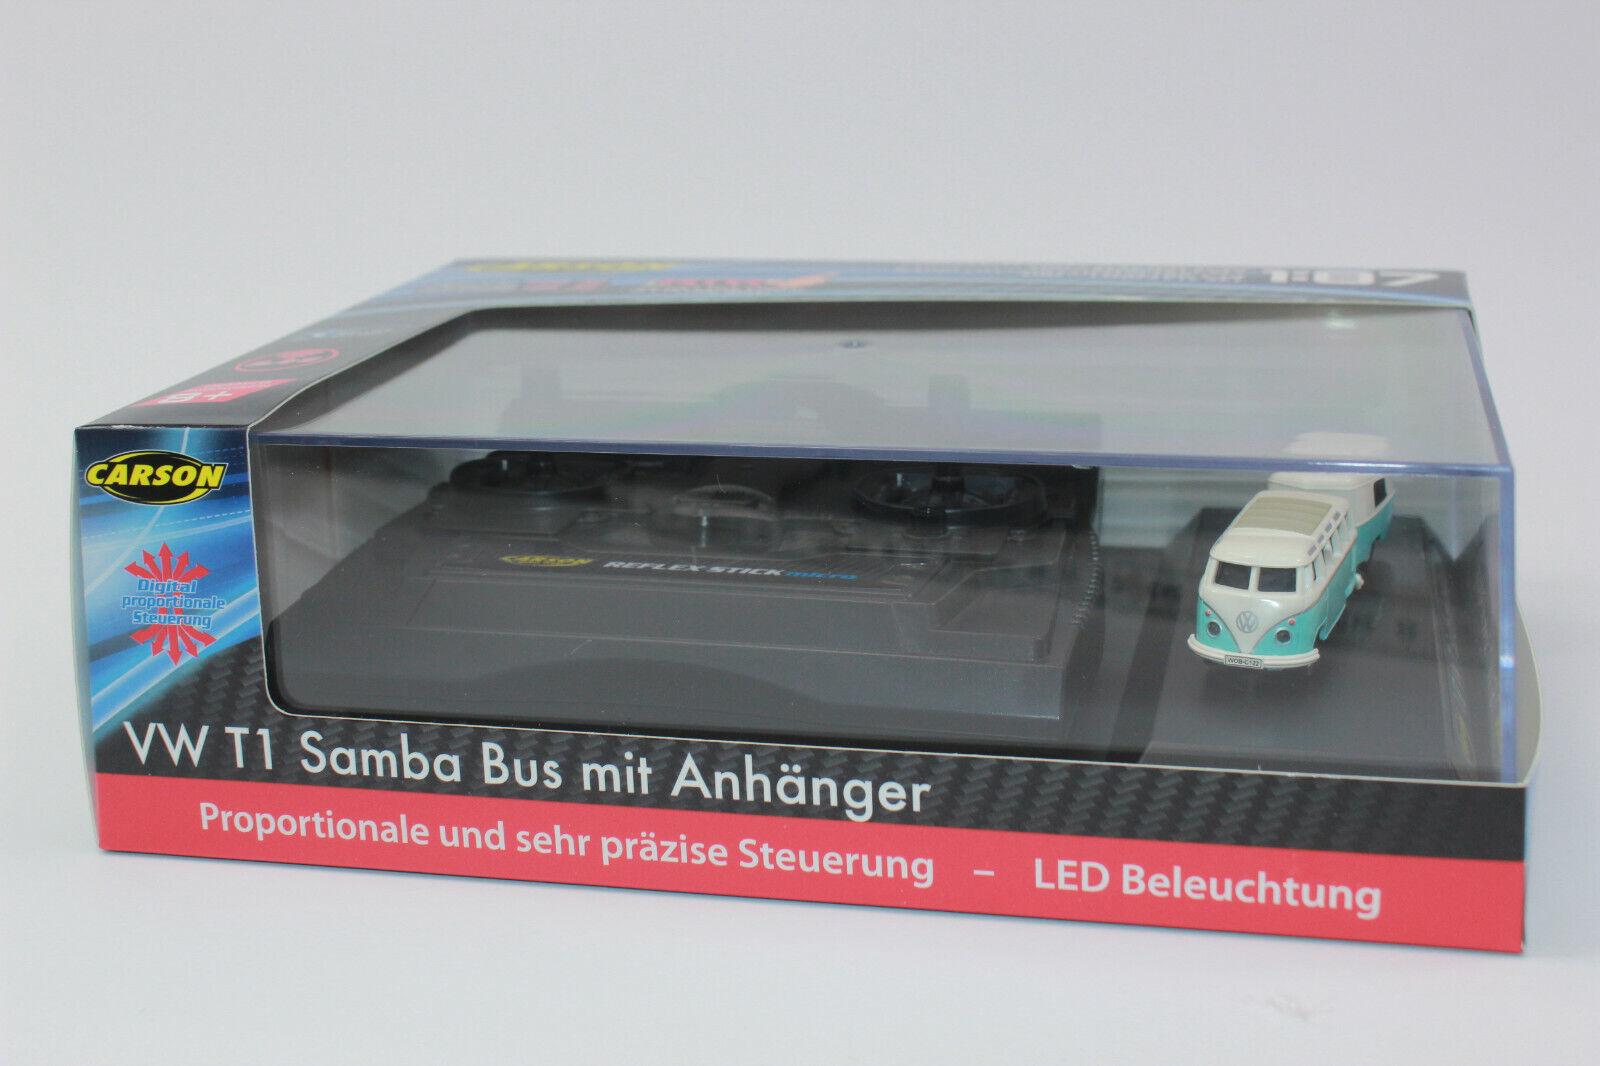 Cocheson 500504122 VW t1 samba bus + remolques 2.4g 1 87 100% rtr nuevo embalaje original